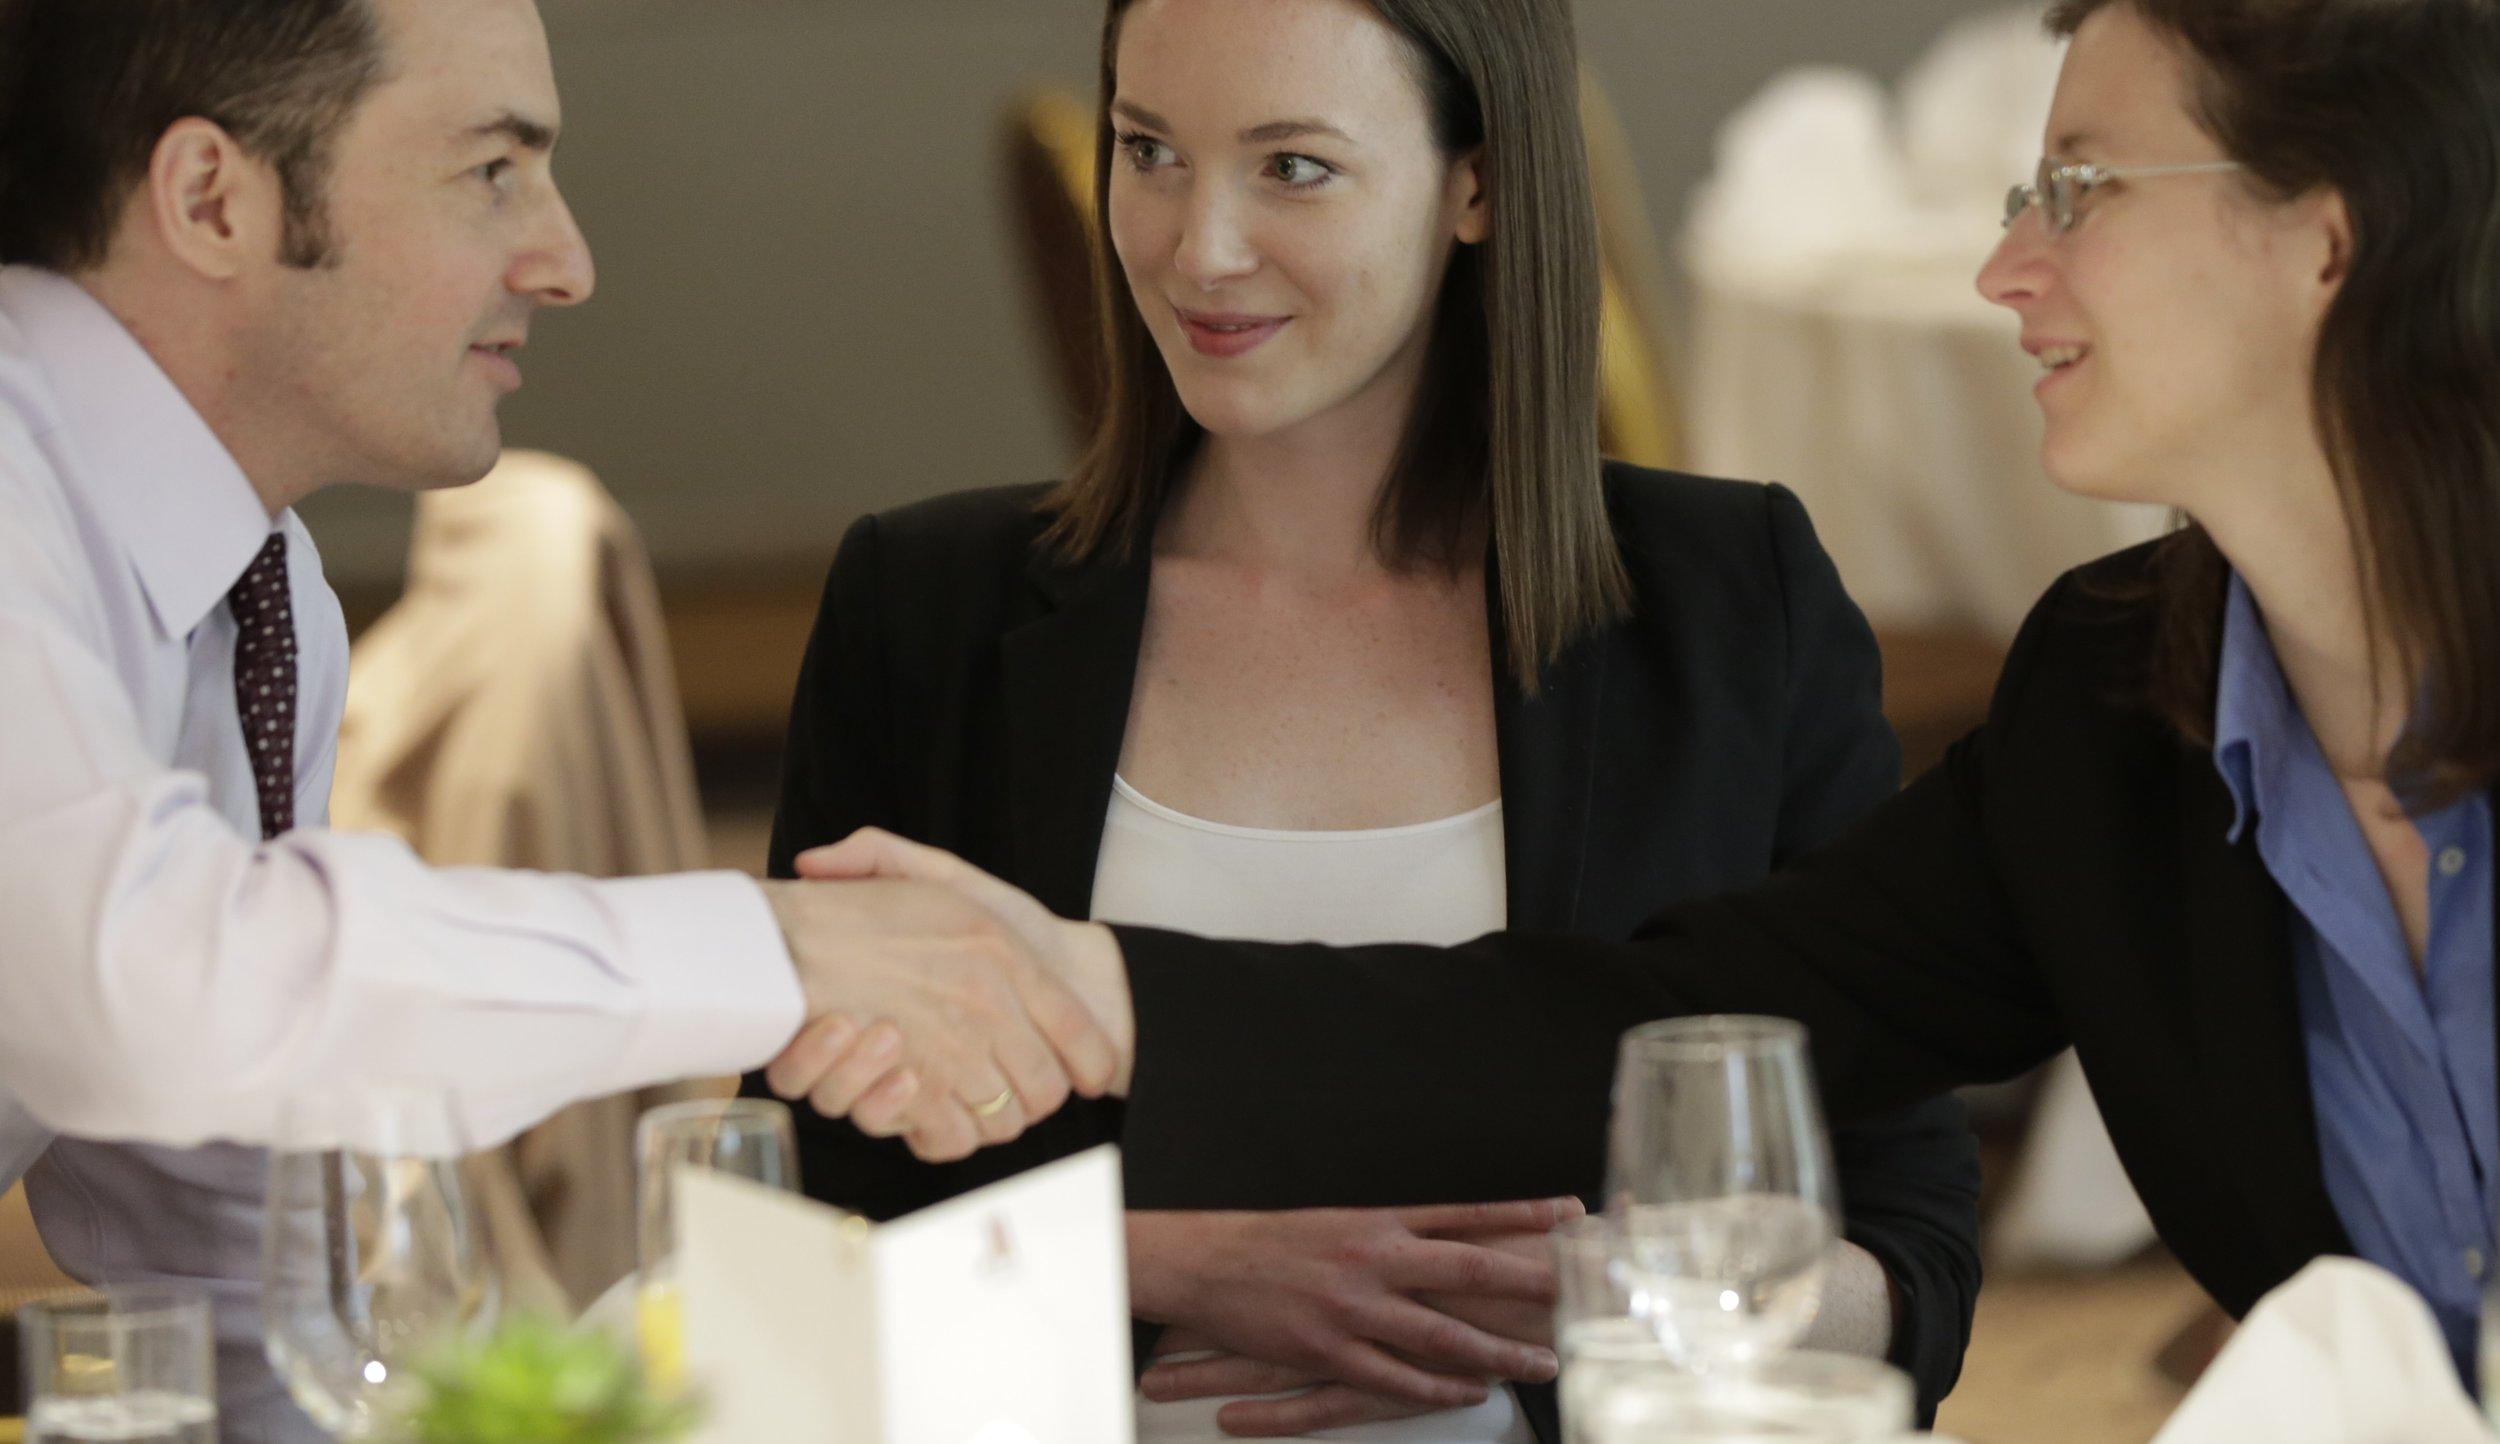 May 2015 - Business Lunch - 1st meeting: Gregory Tessler, Margaret Childs, CEO of Metropole and Andreja Mrzel, Manager at BlackLine